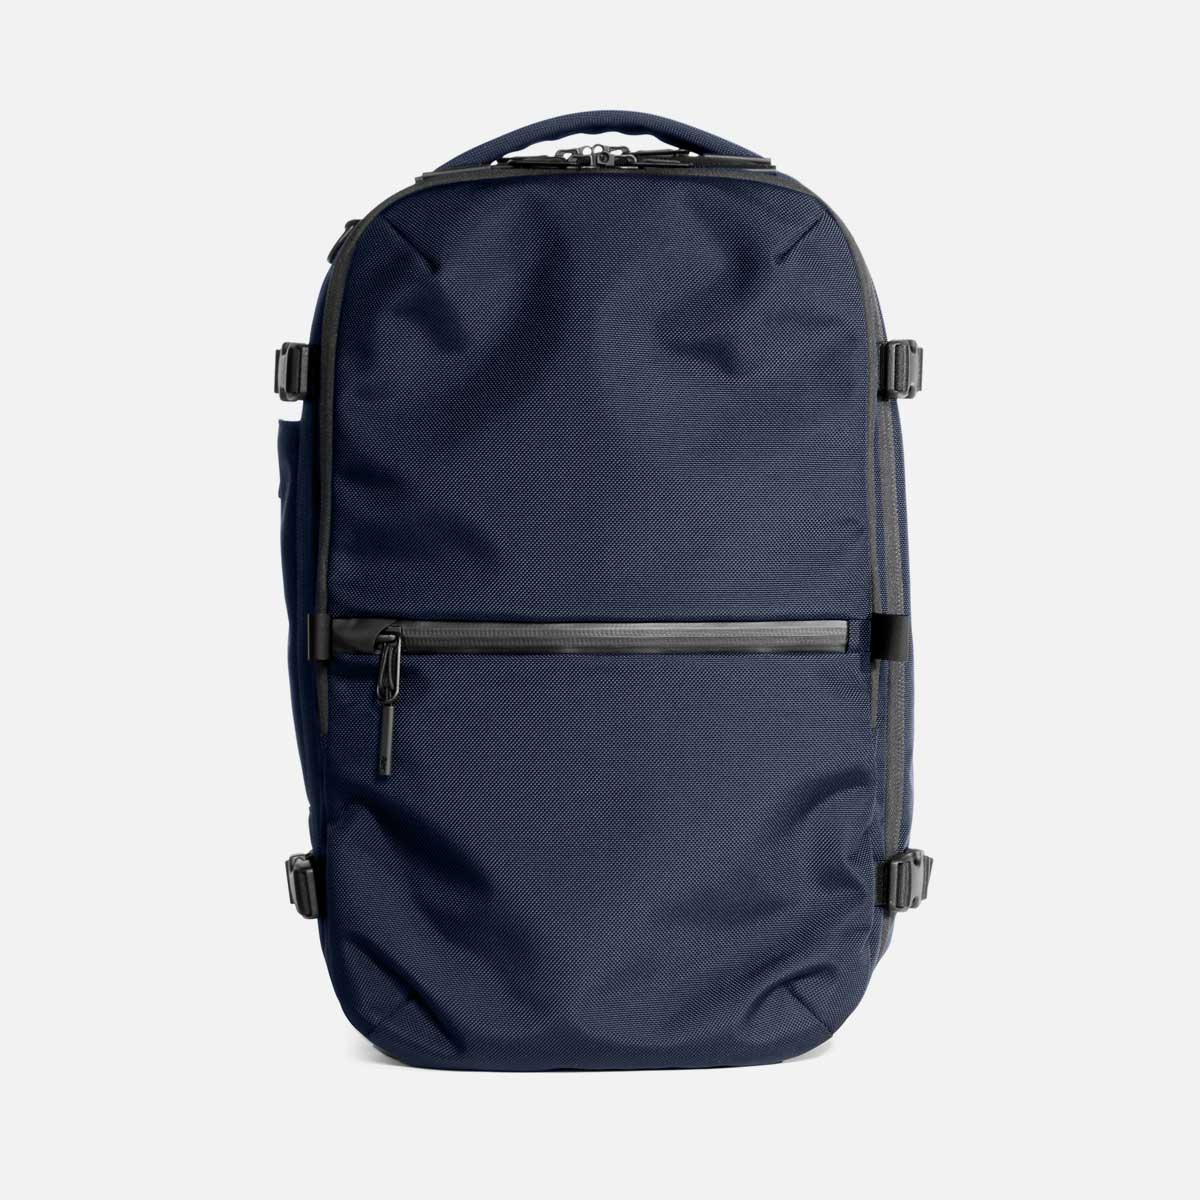 23007_travelpack2_navy_front.jpg